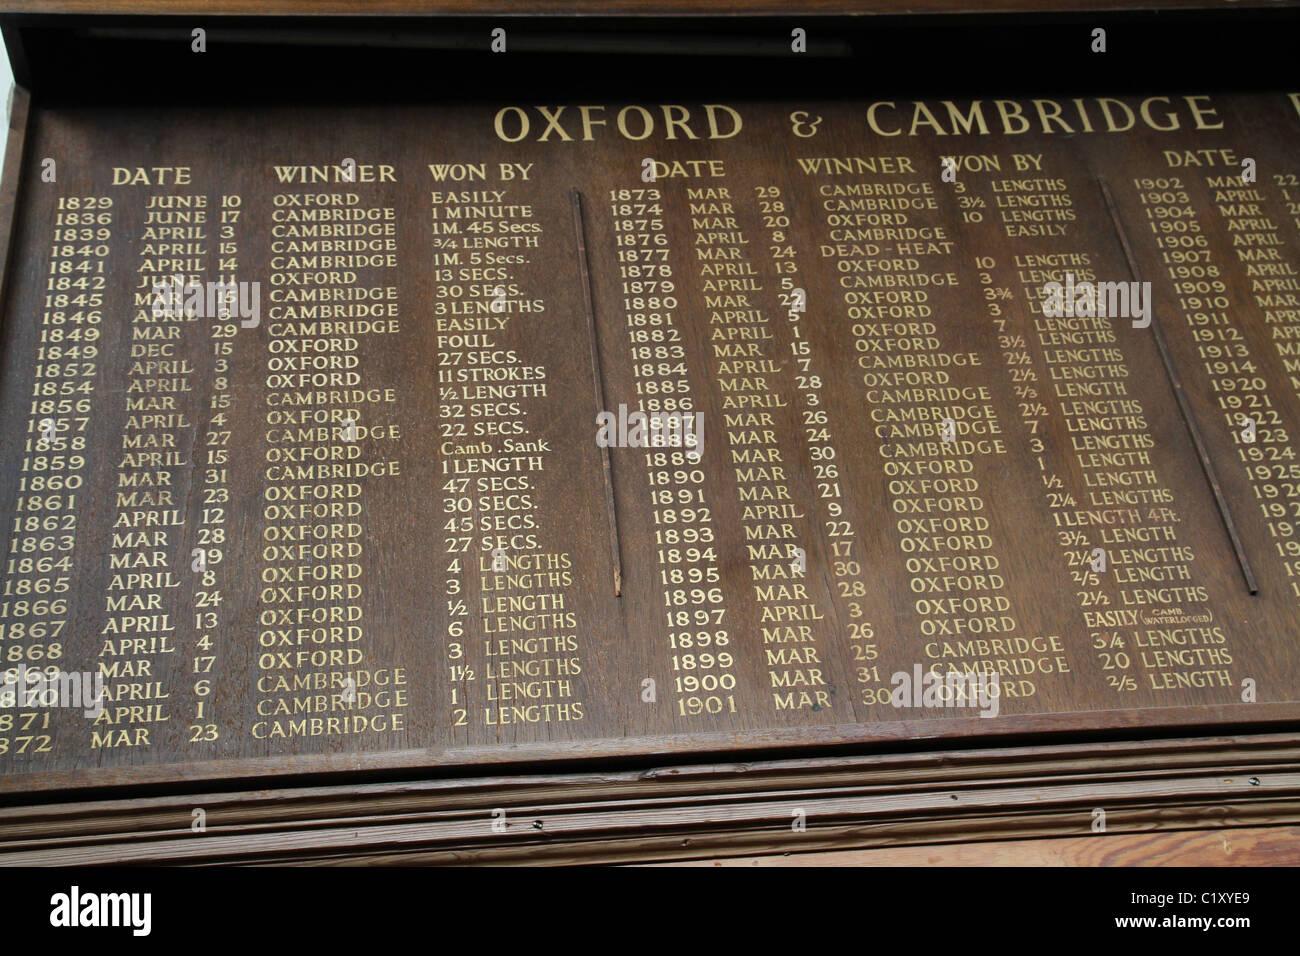 UK. OXFORD VS. CAMBRIDGE BOAT RACE MEMORABILIA AT WIMBLEDON ROWING CLUB BY THAMES RIVER - Stock Image